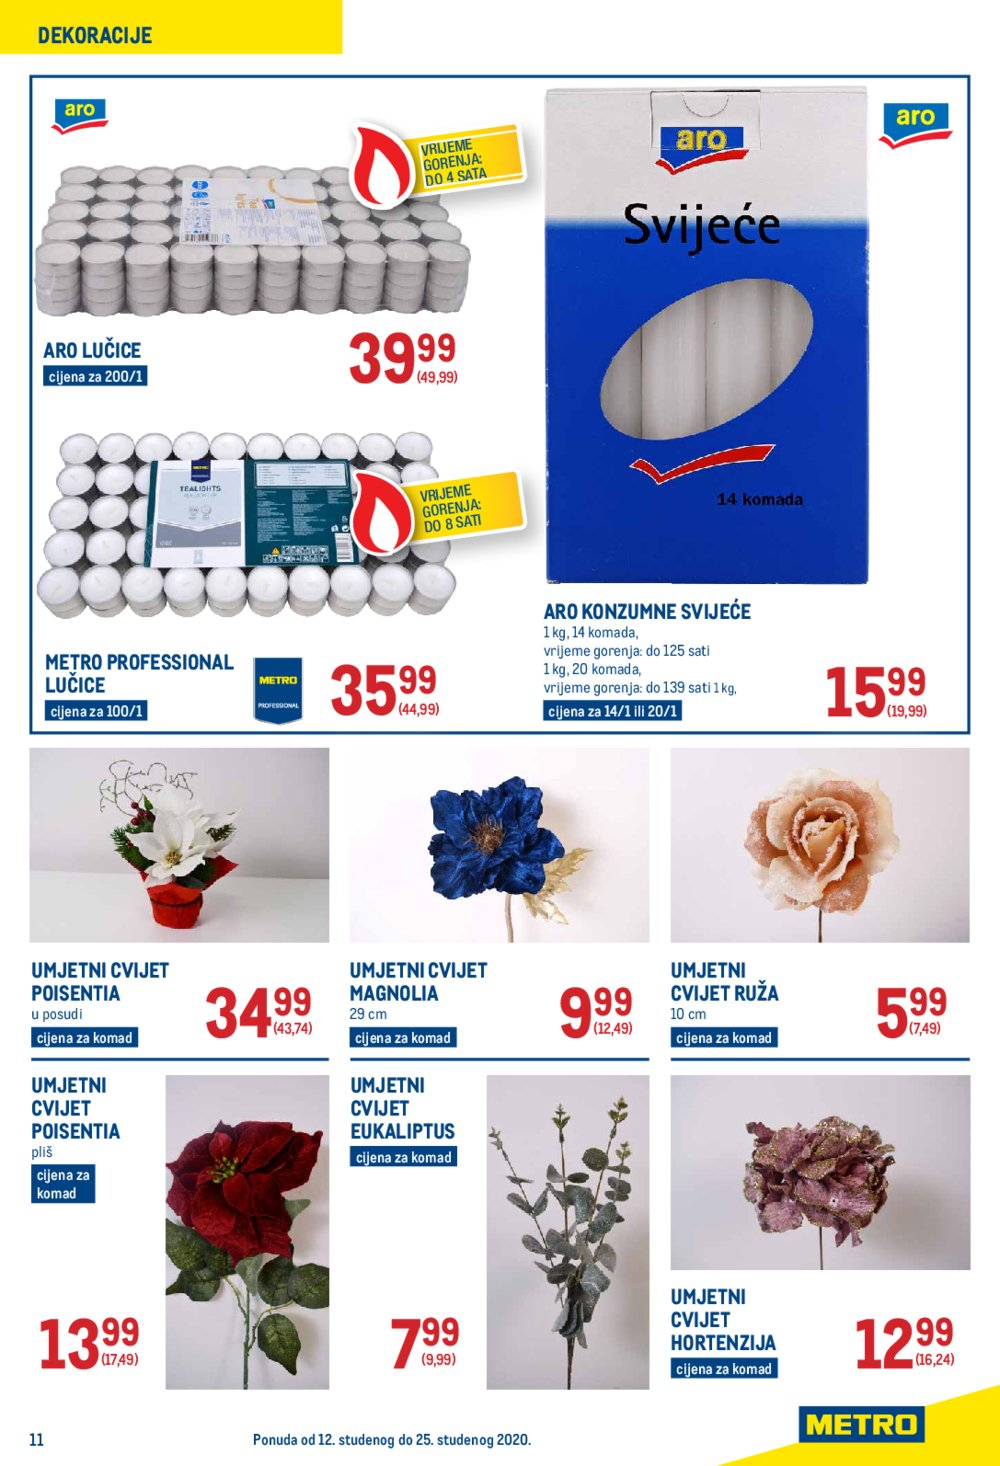 Metro katalog Neprehrana 12.11.-25.11. Jankomir i Sesvete